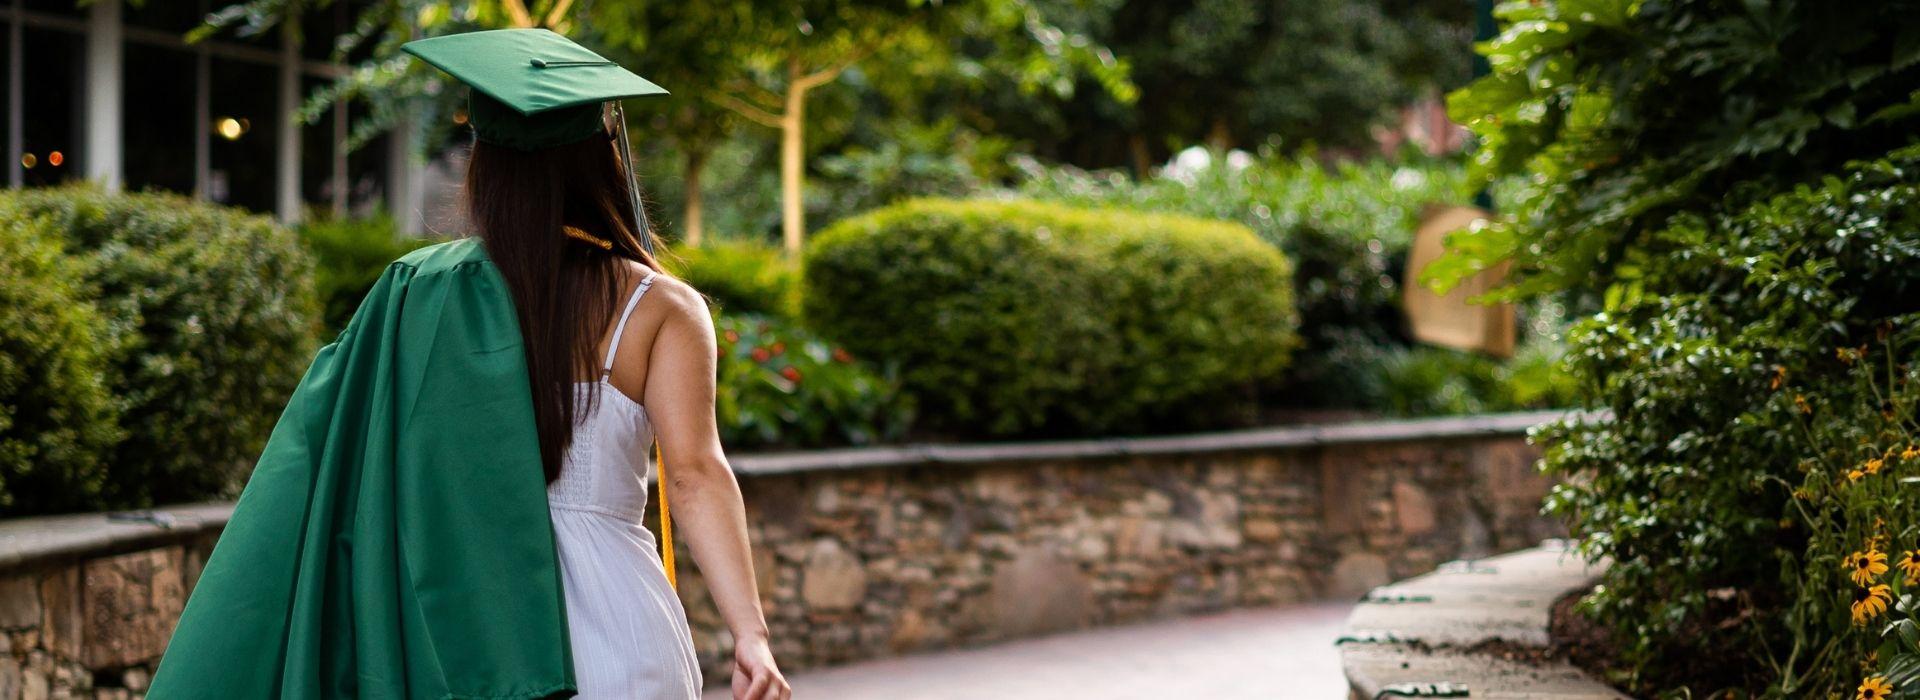 Woman wearing a grad gown